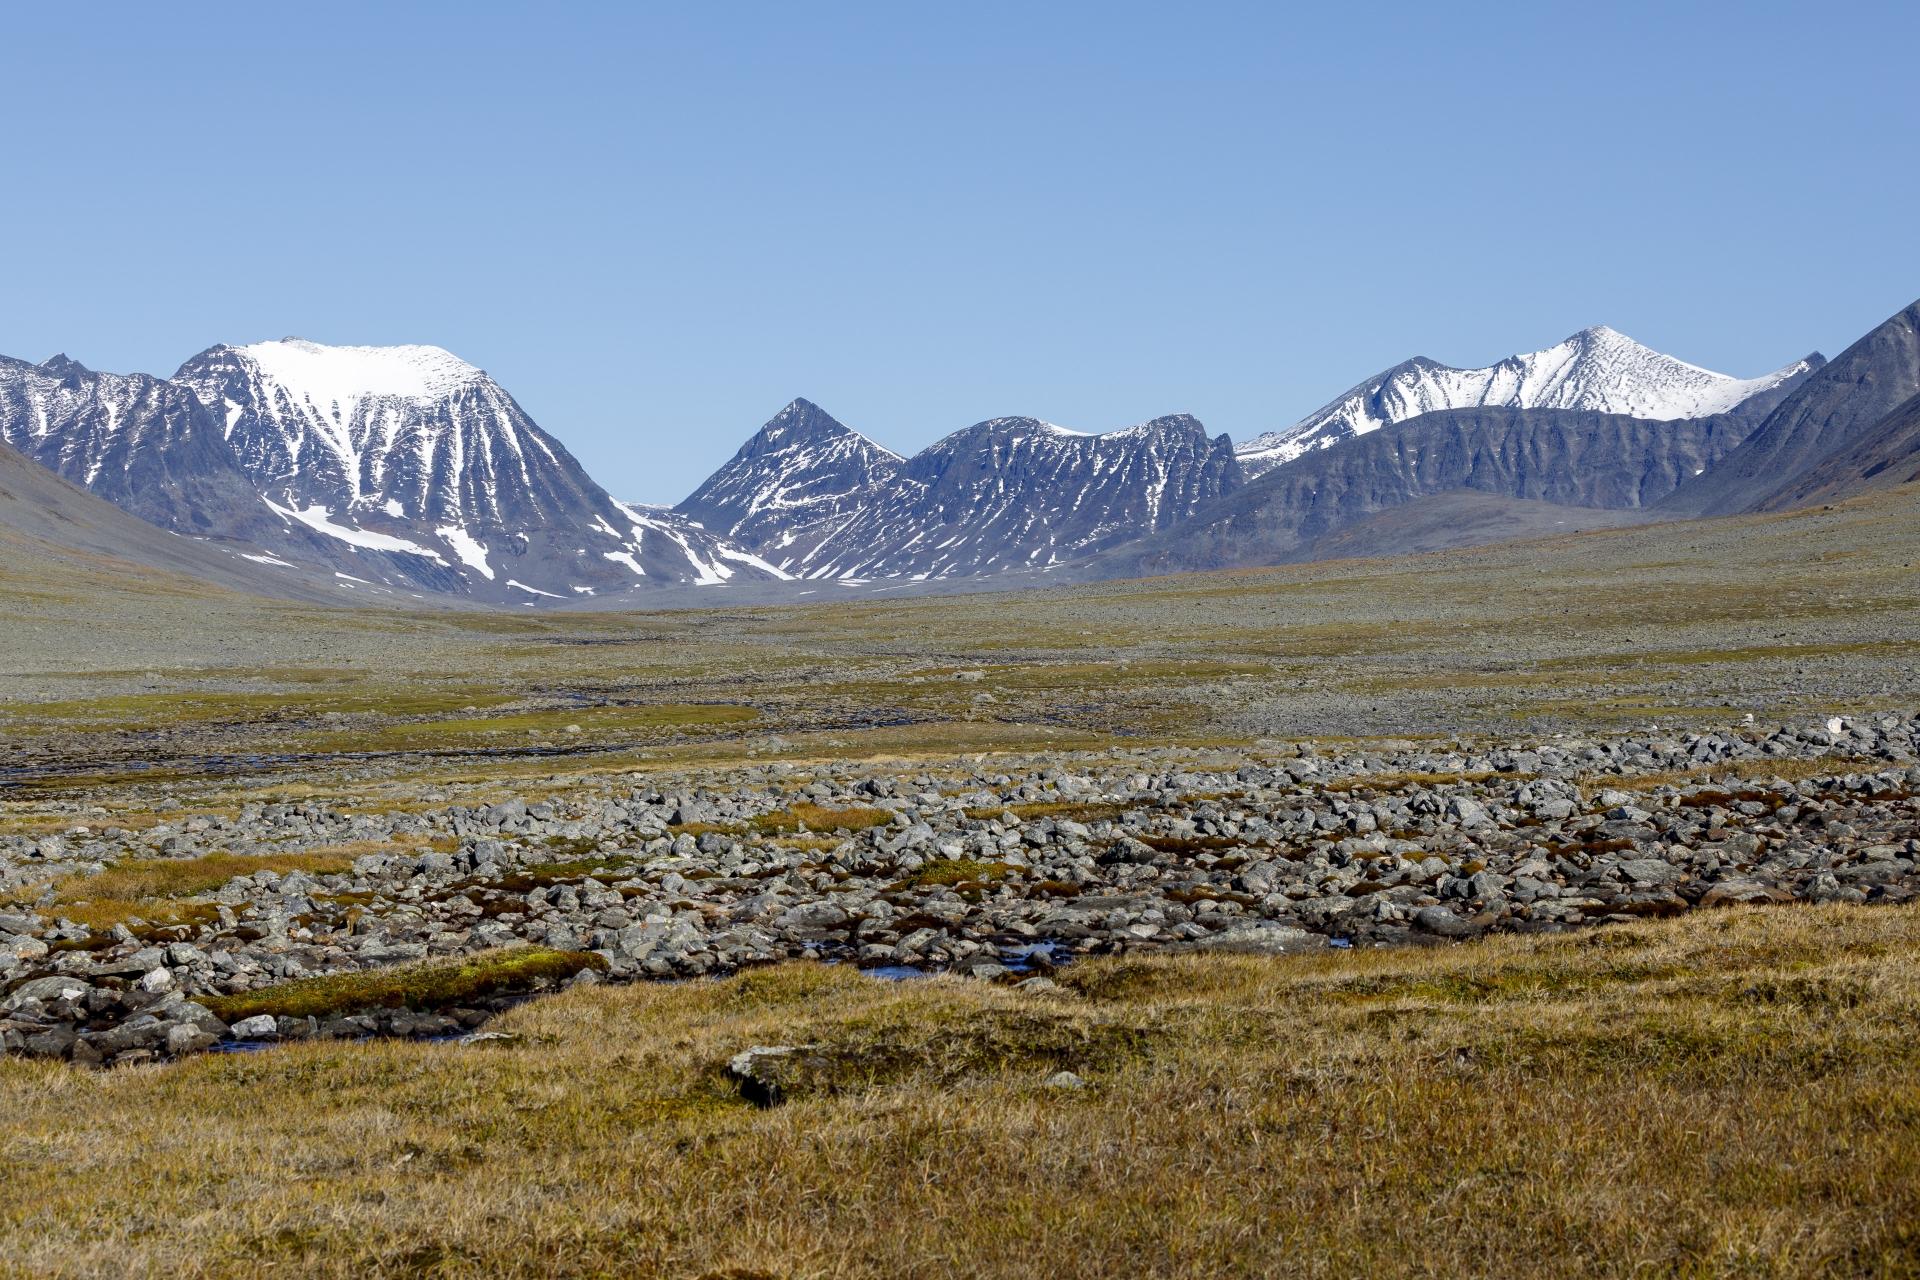 Im Stuor Reaiddávággi mit  Blick auf die Gipfel des Tjäktjajåkka, Šielmmácohkka und Nállu